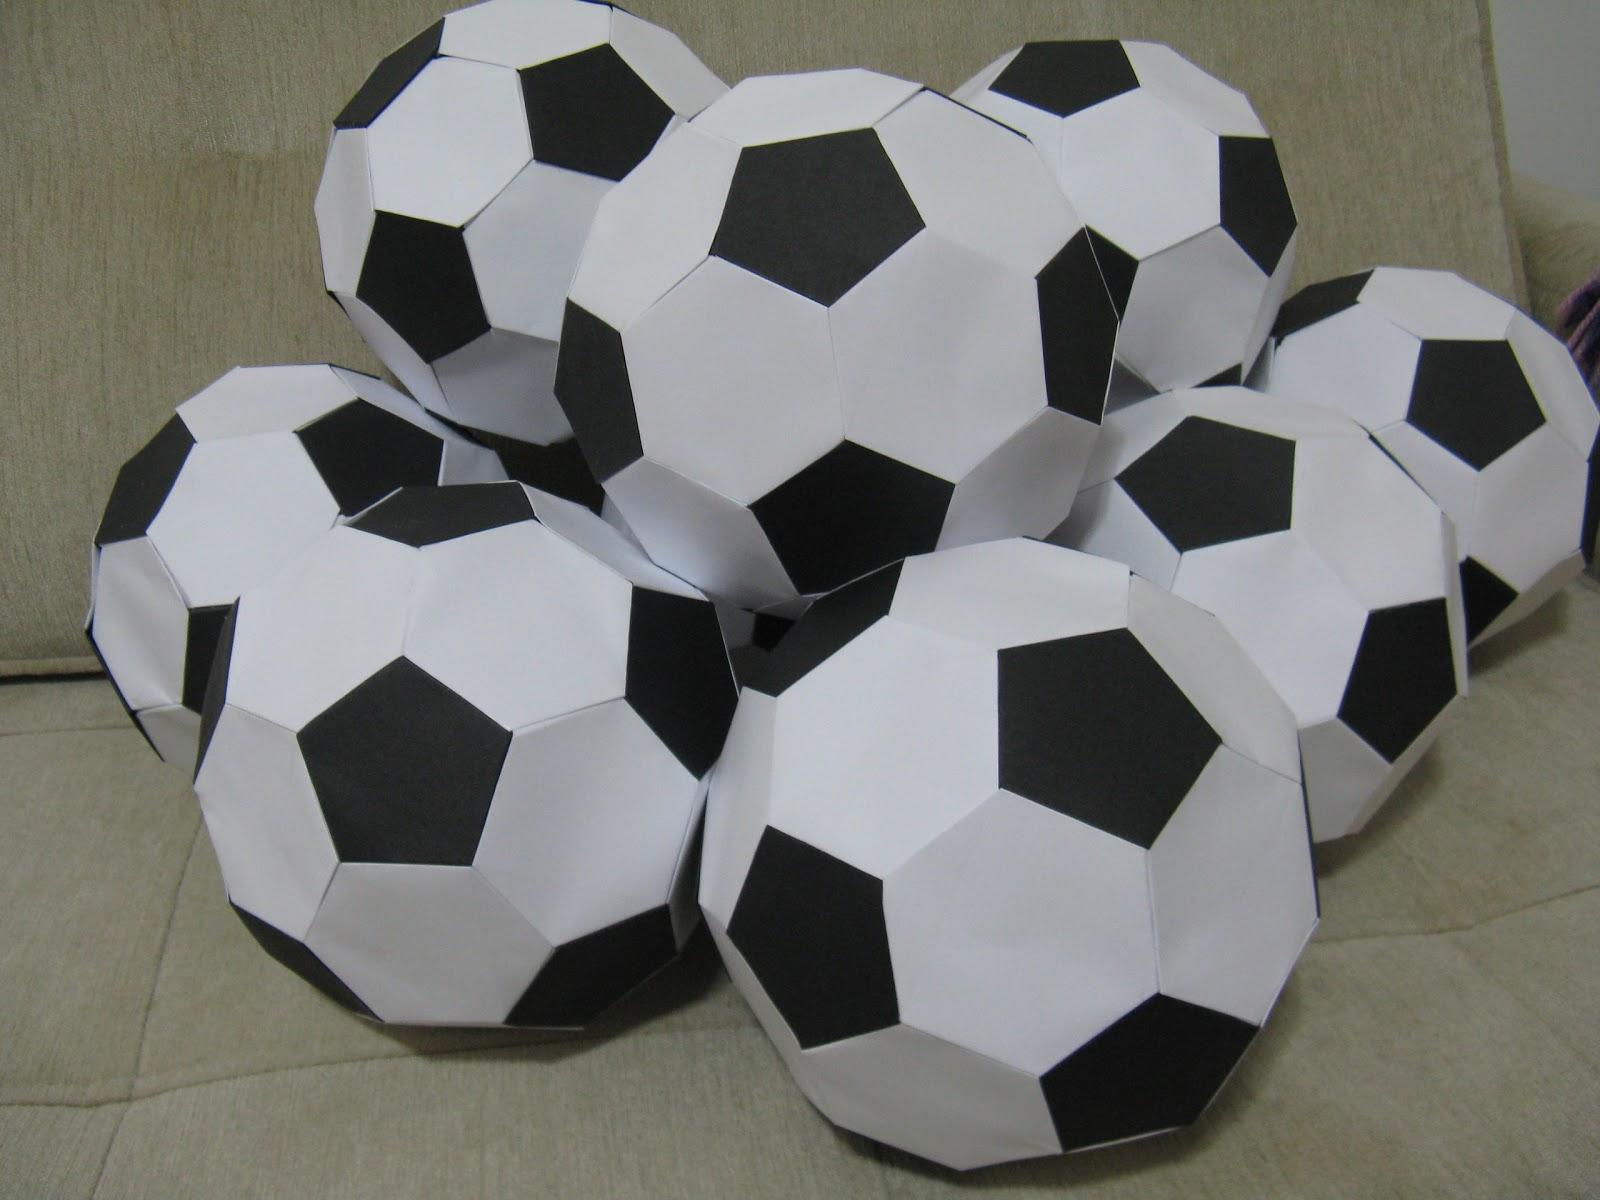 1f88212d71 Esta encomenda de bolas de futebol